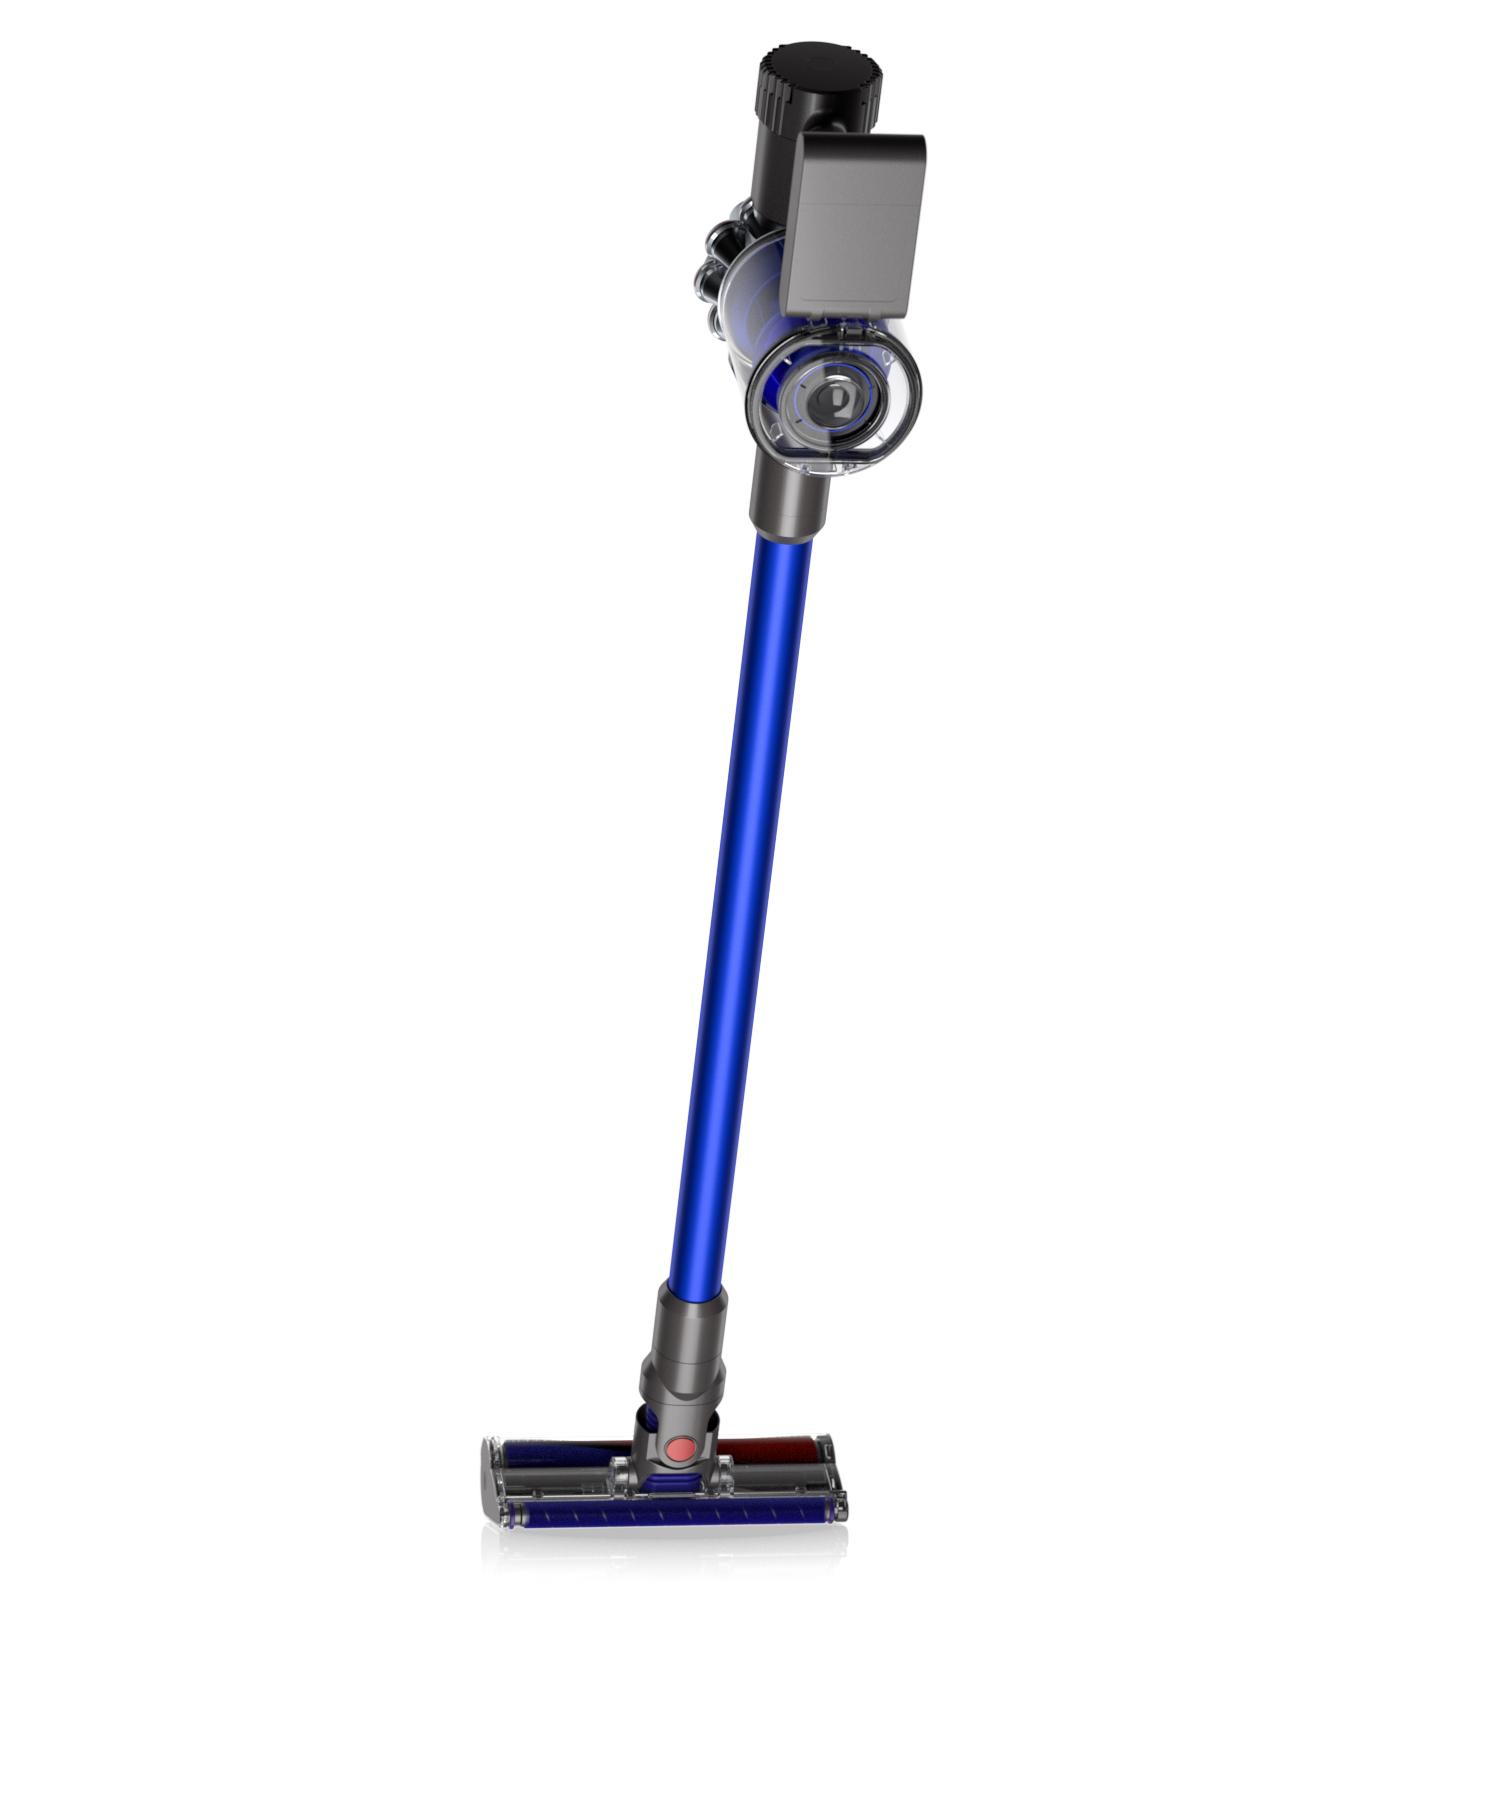 dyson akkusauger v6 dyson v6 slim cordless stick vacuum. Black Bedroom Furniture Sets. Home Design Ideas